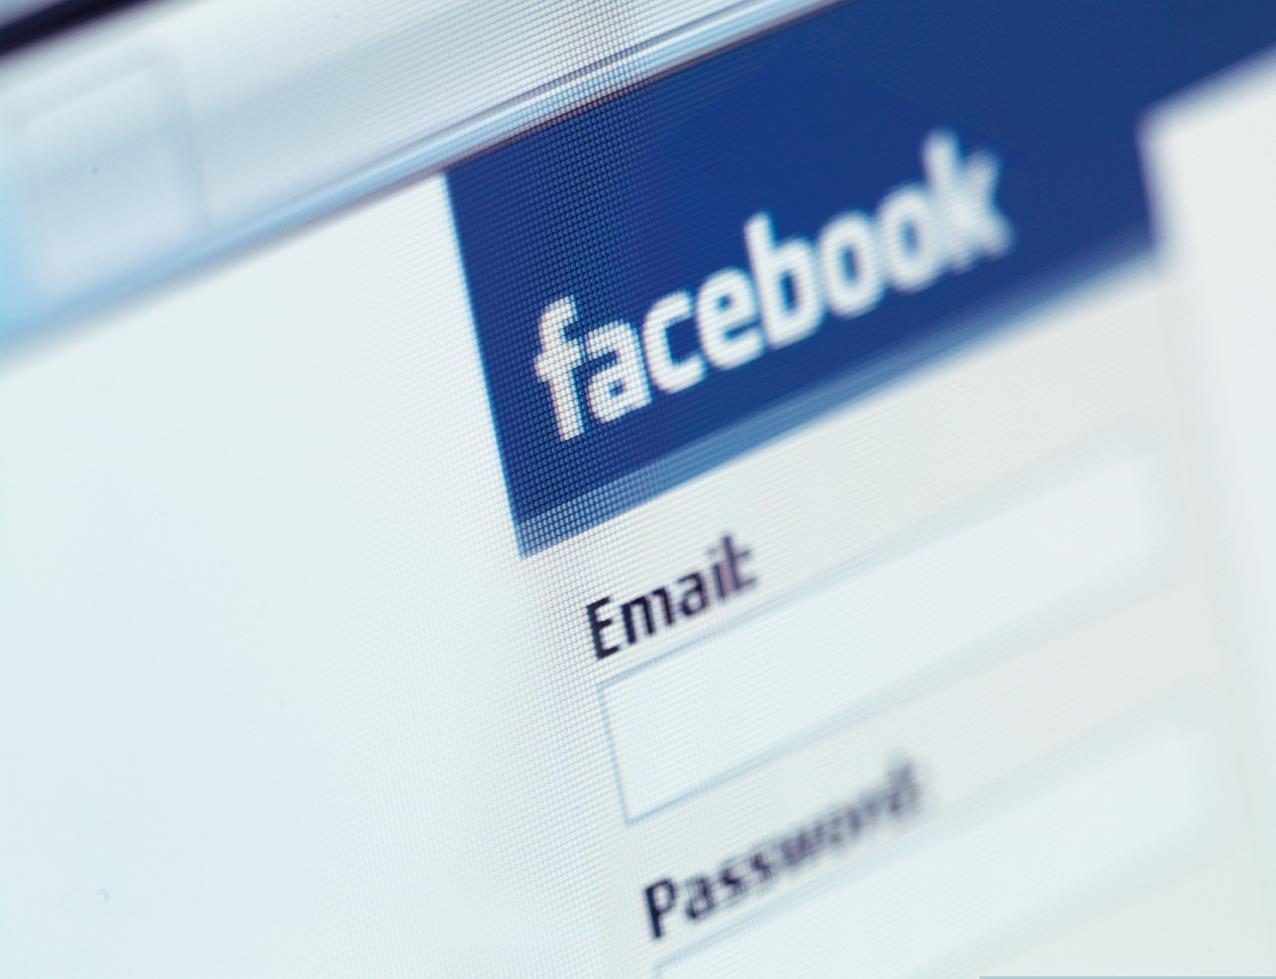 Come navigare sicuri su Facebook